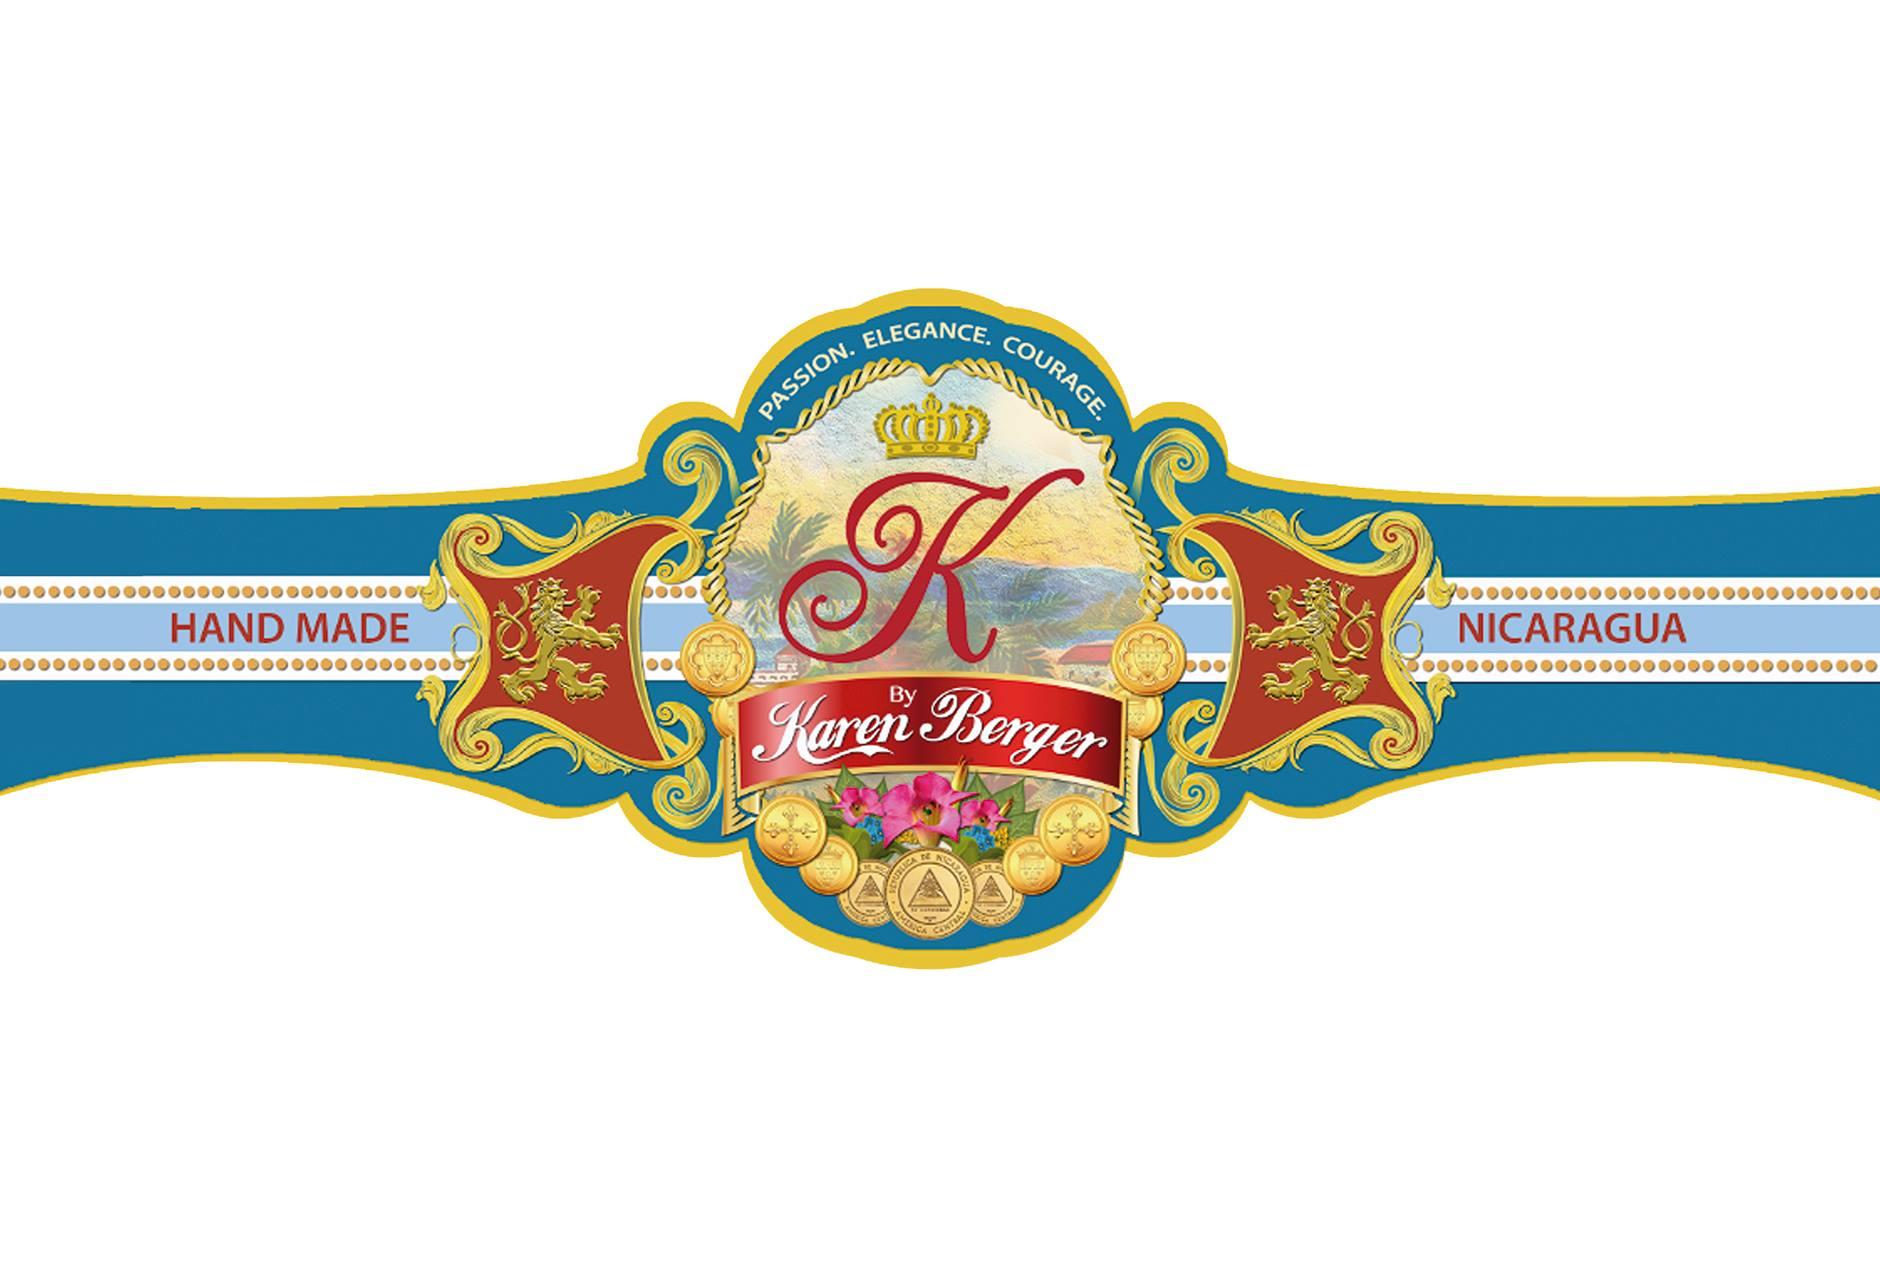 k_by_karen_berger_don_kiki_cigars_nicaraguai_szivarok_2.jpg